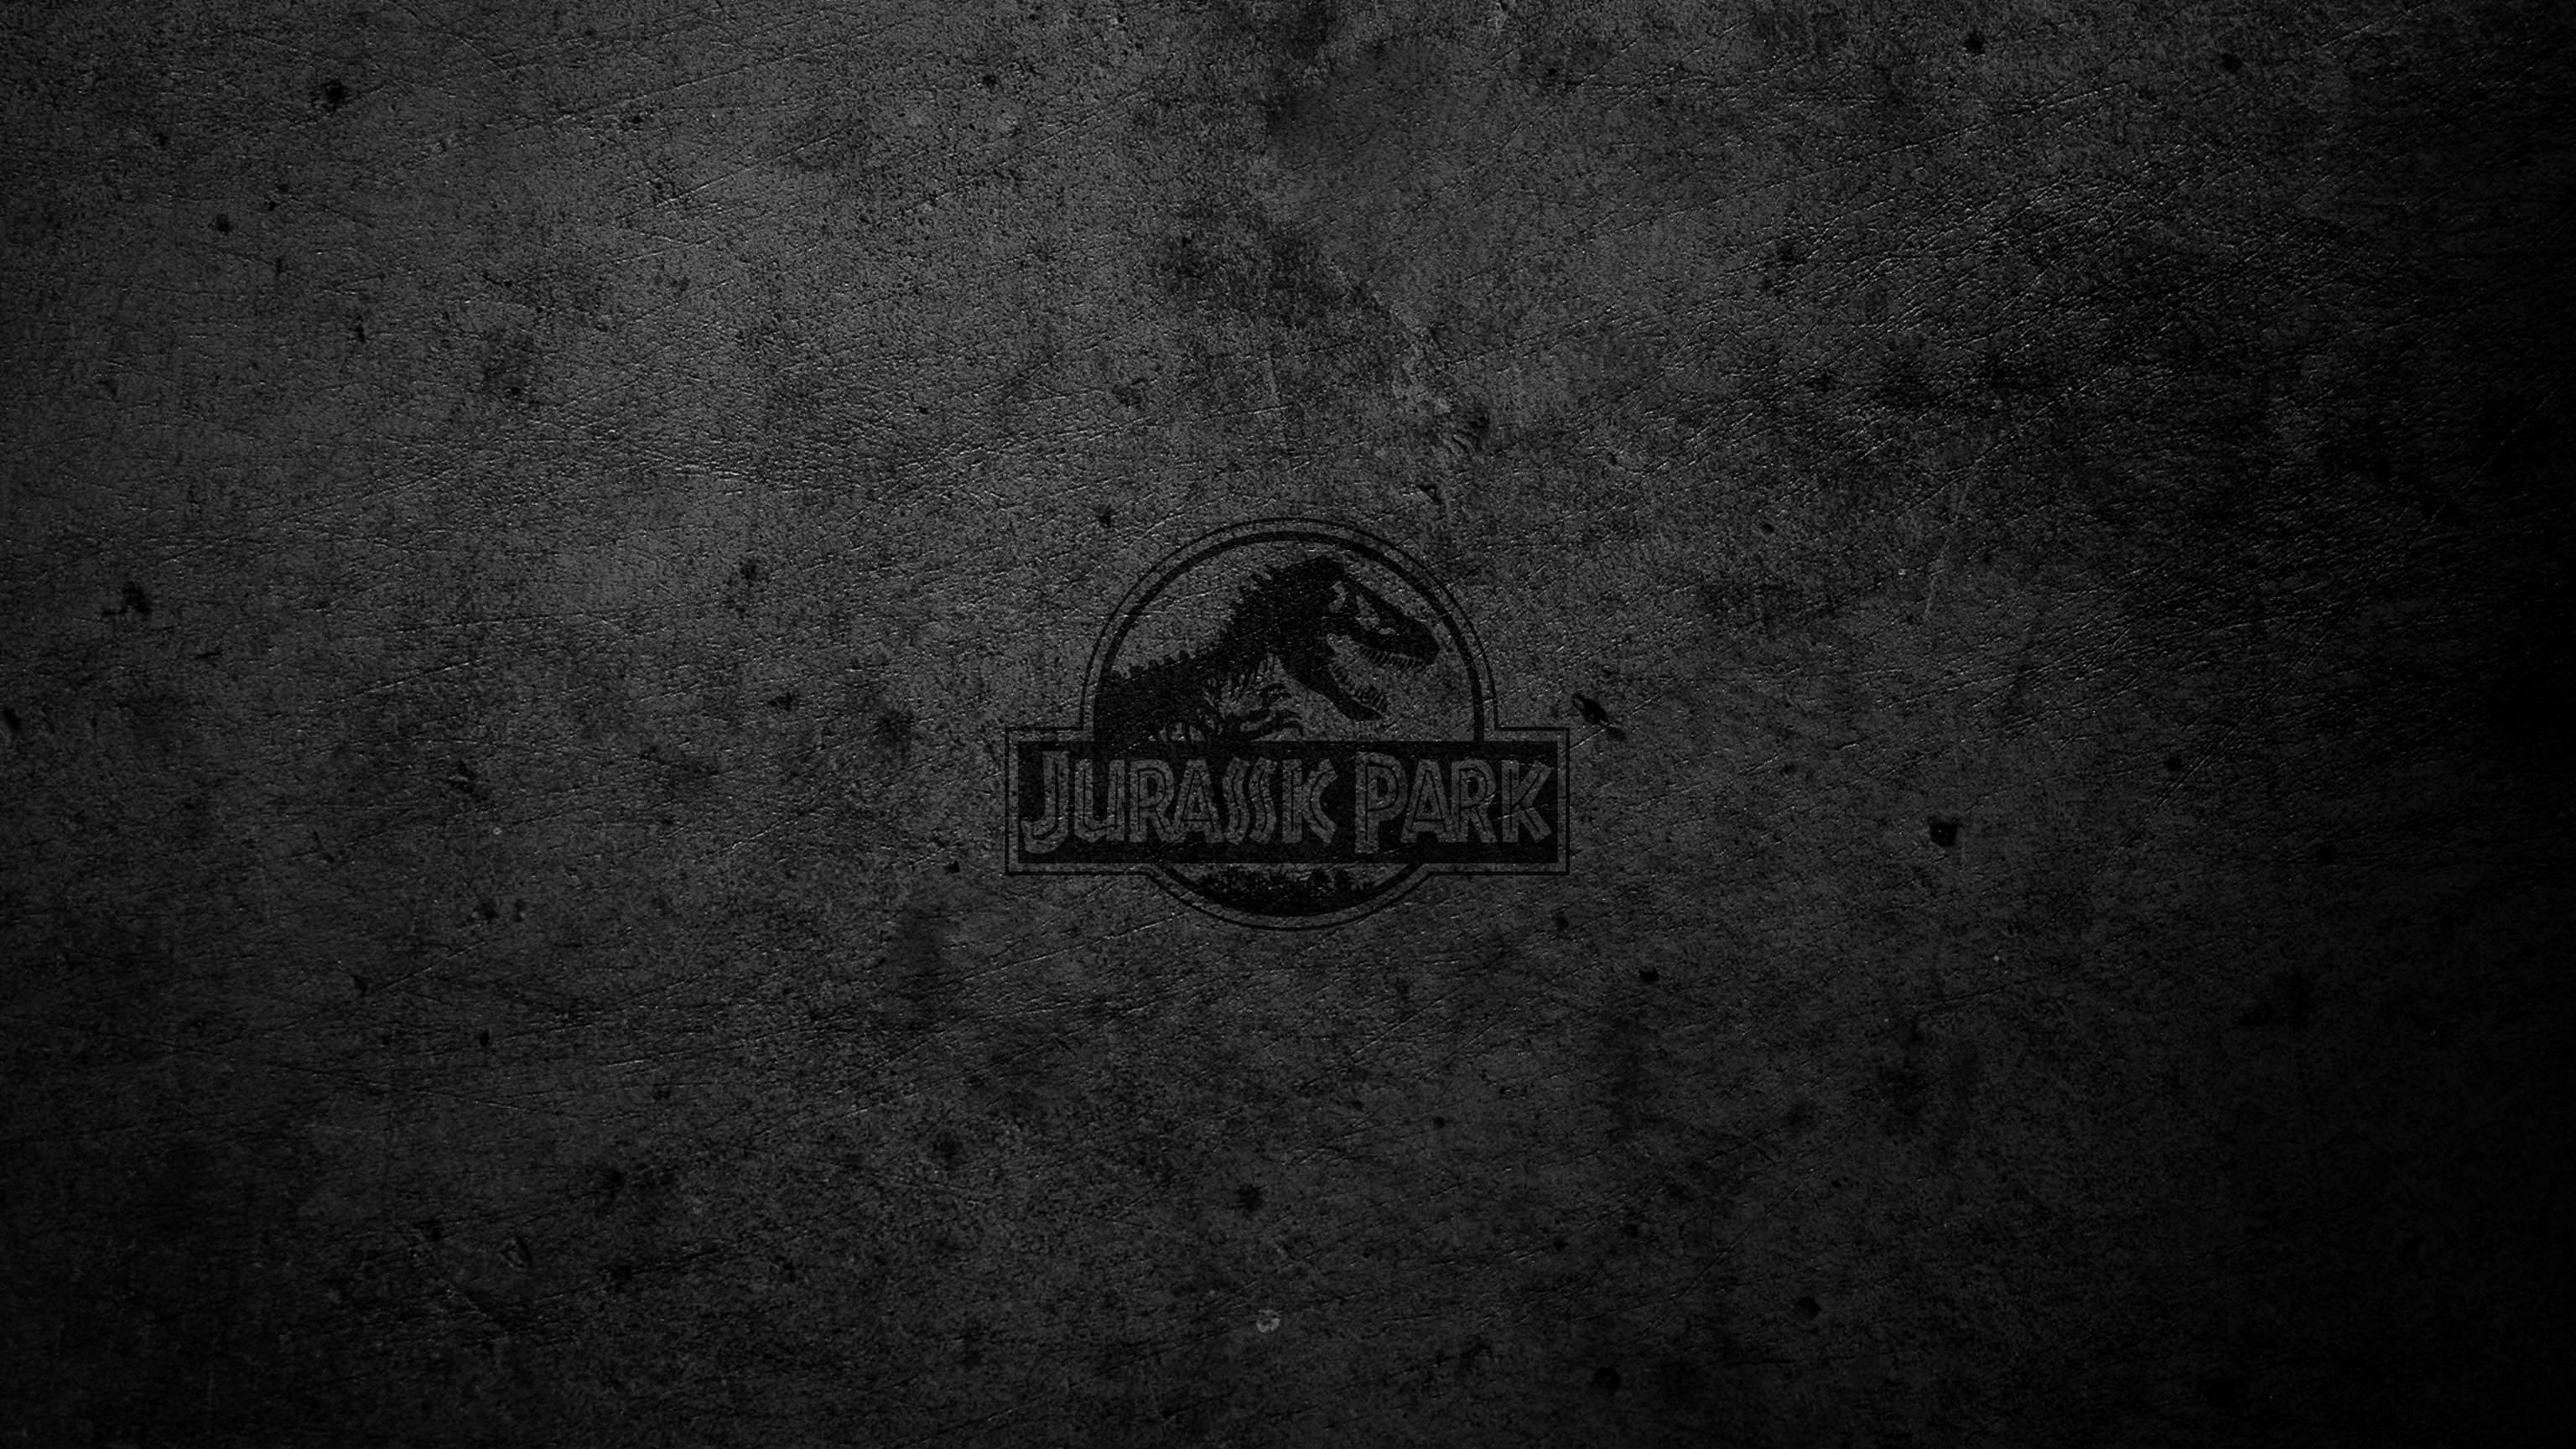 Jurassic Park Wallpaper 4k Fitrini S Wallpaper